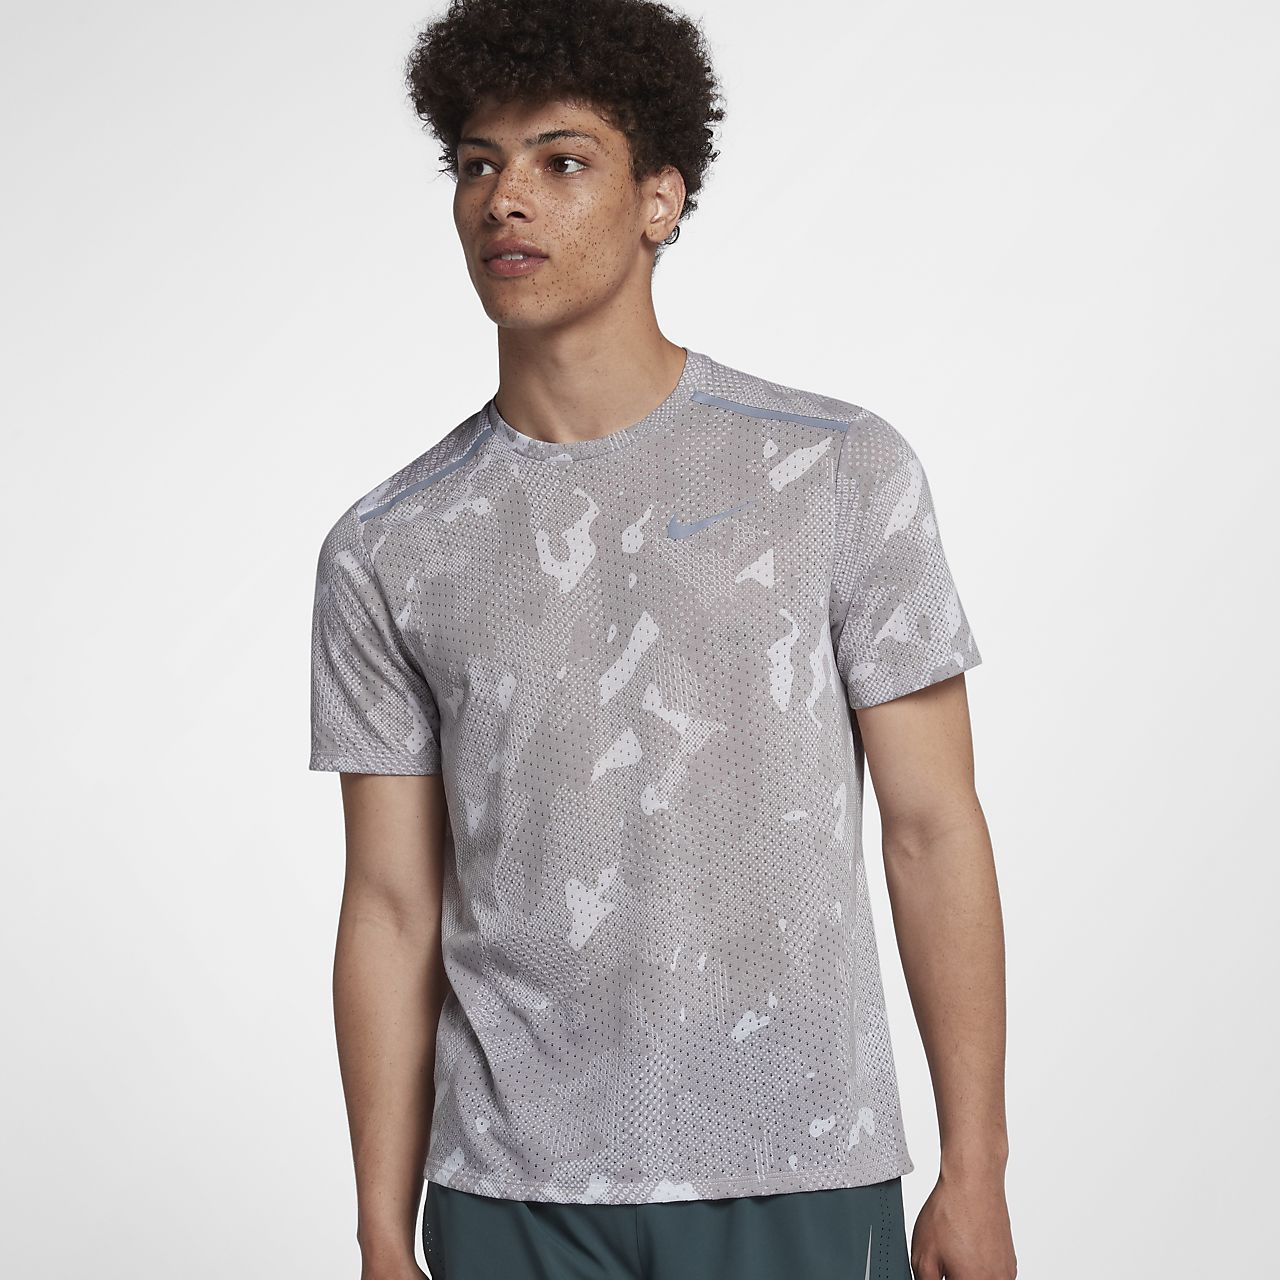 Nike Tailwind Men's Short Sleeve Running Top